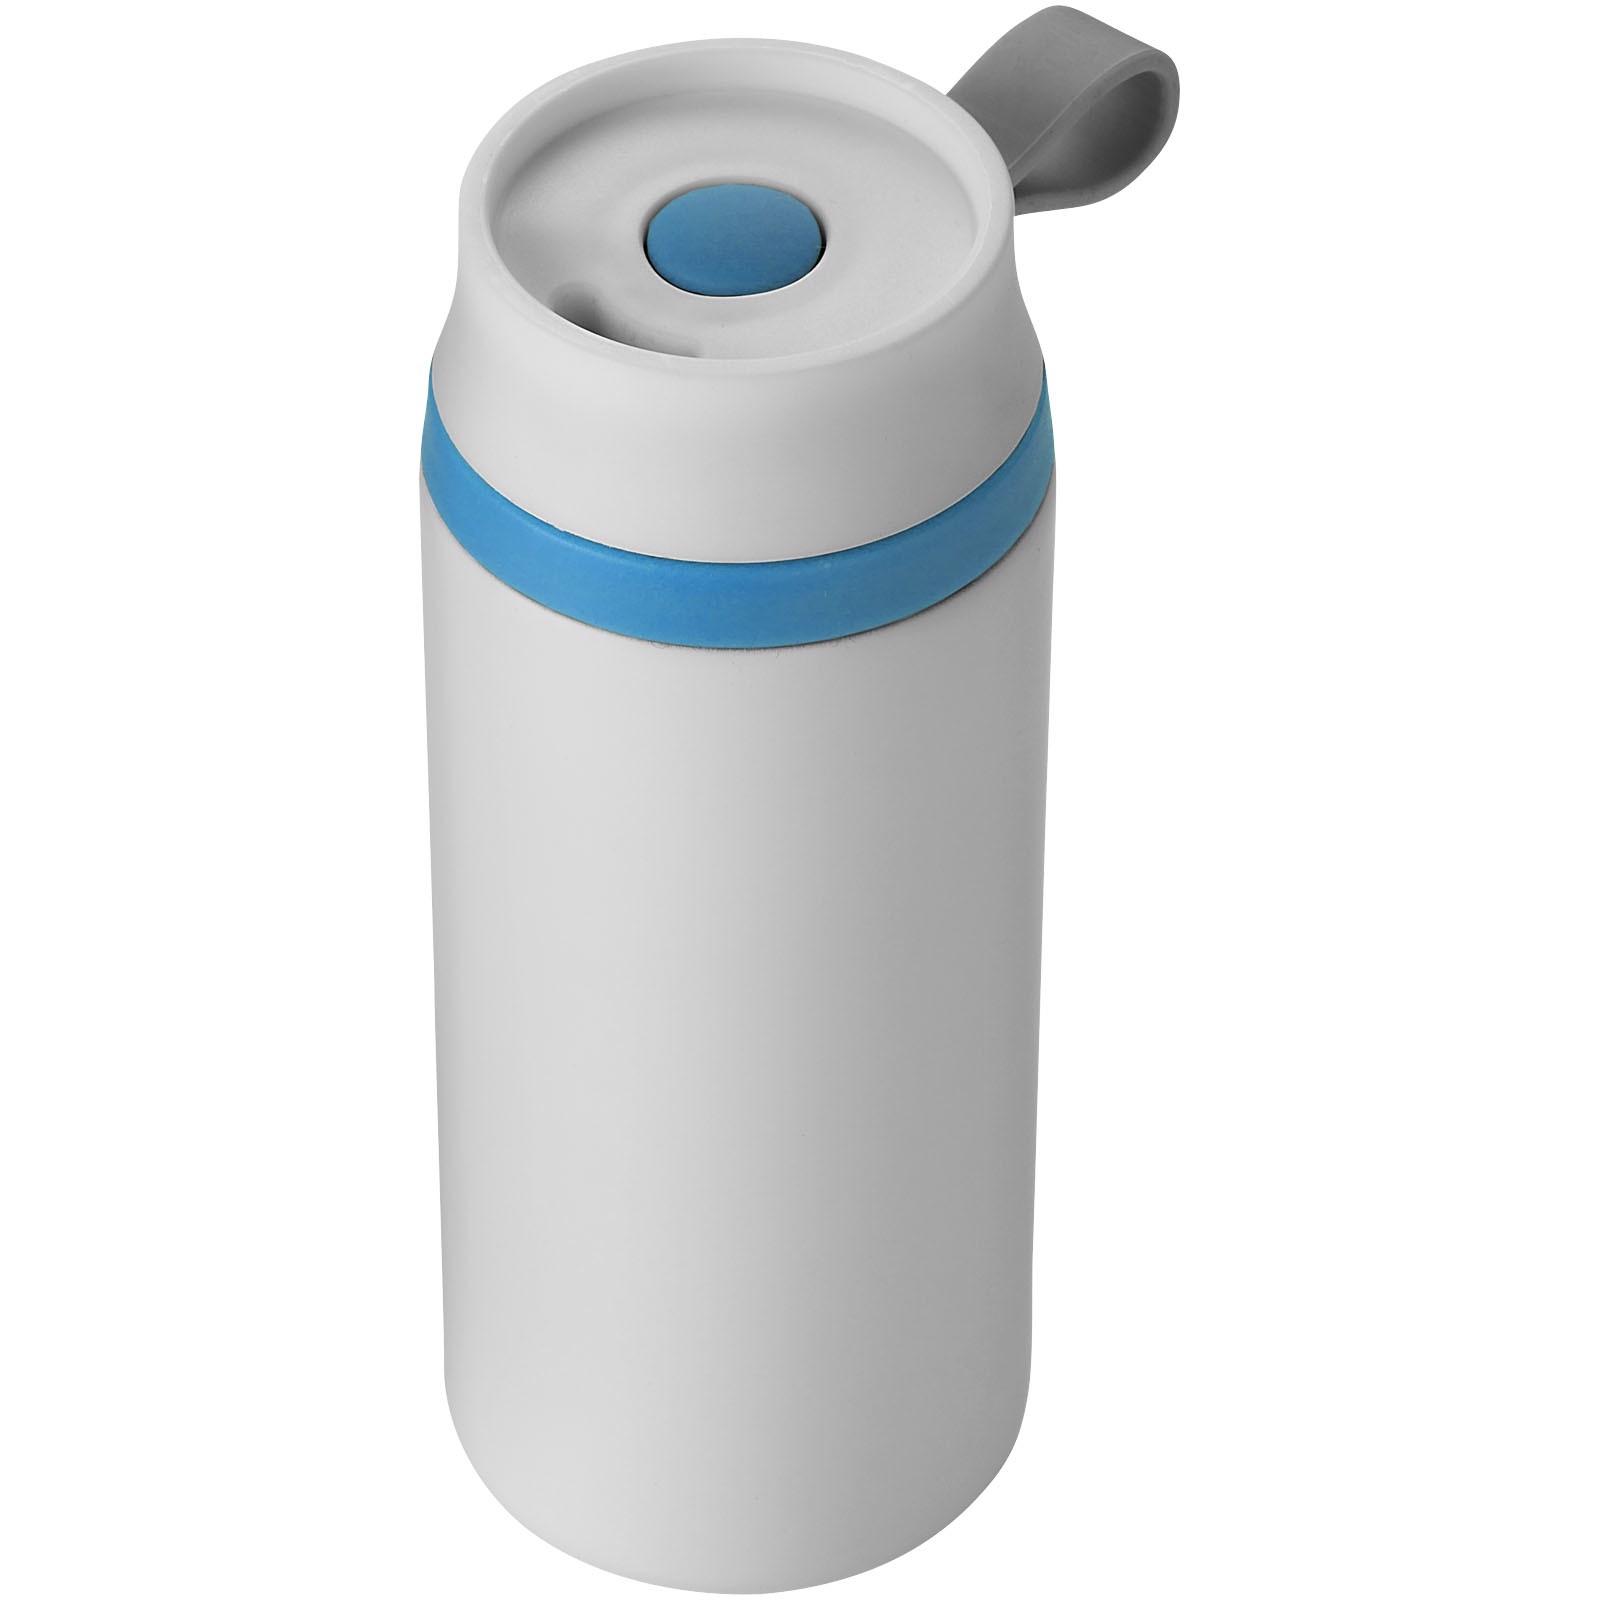 Vodotěsná termoska Flow - Bílá / Process blue